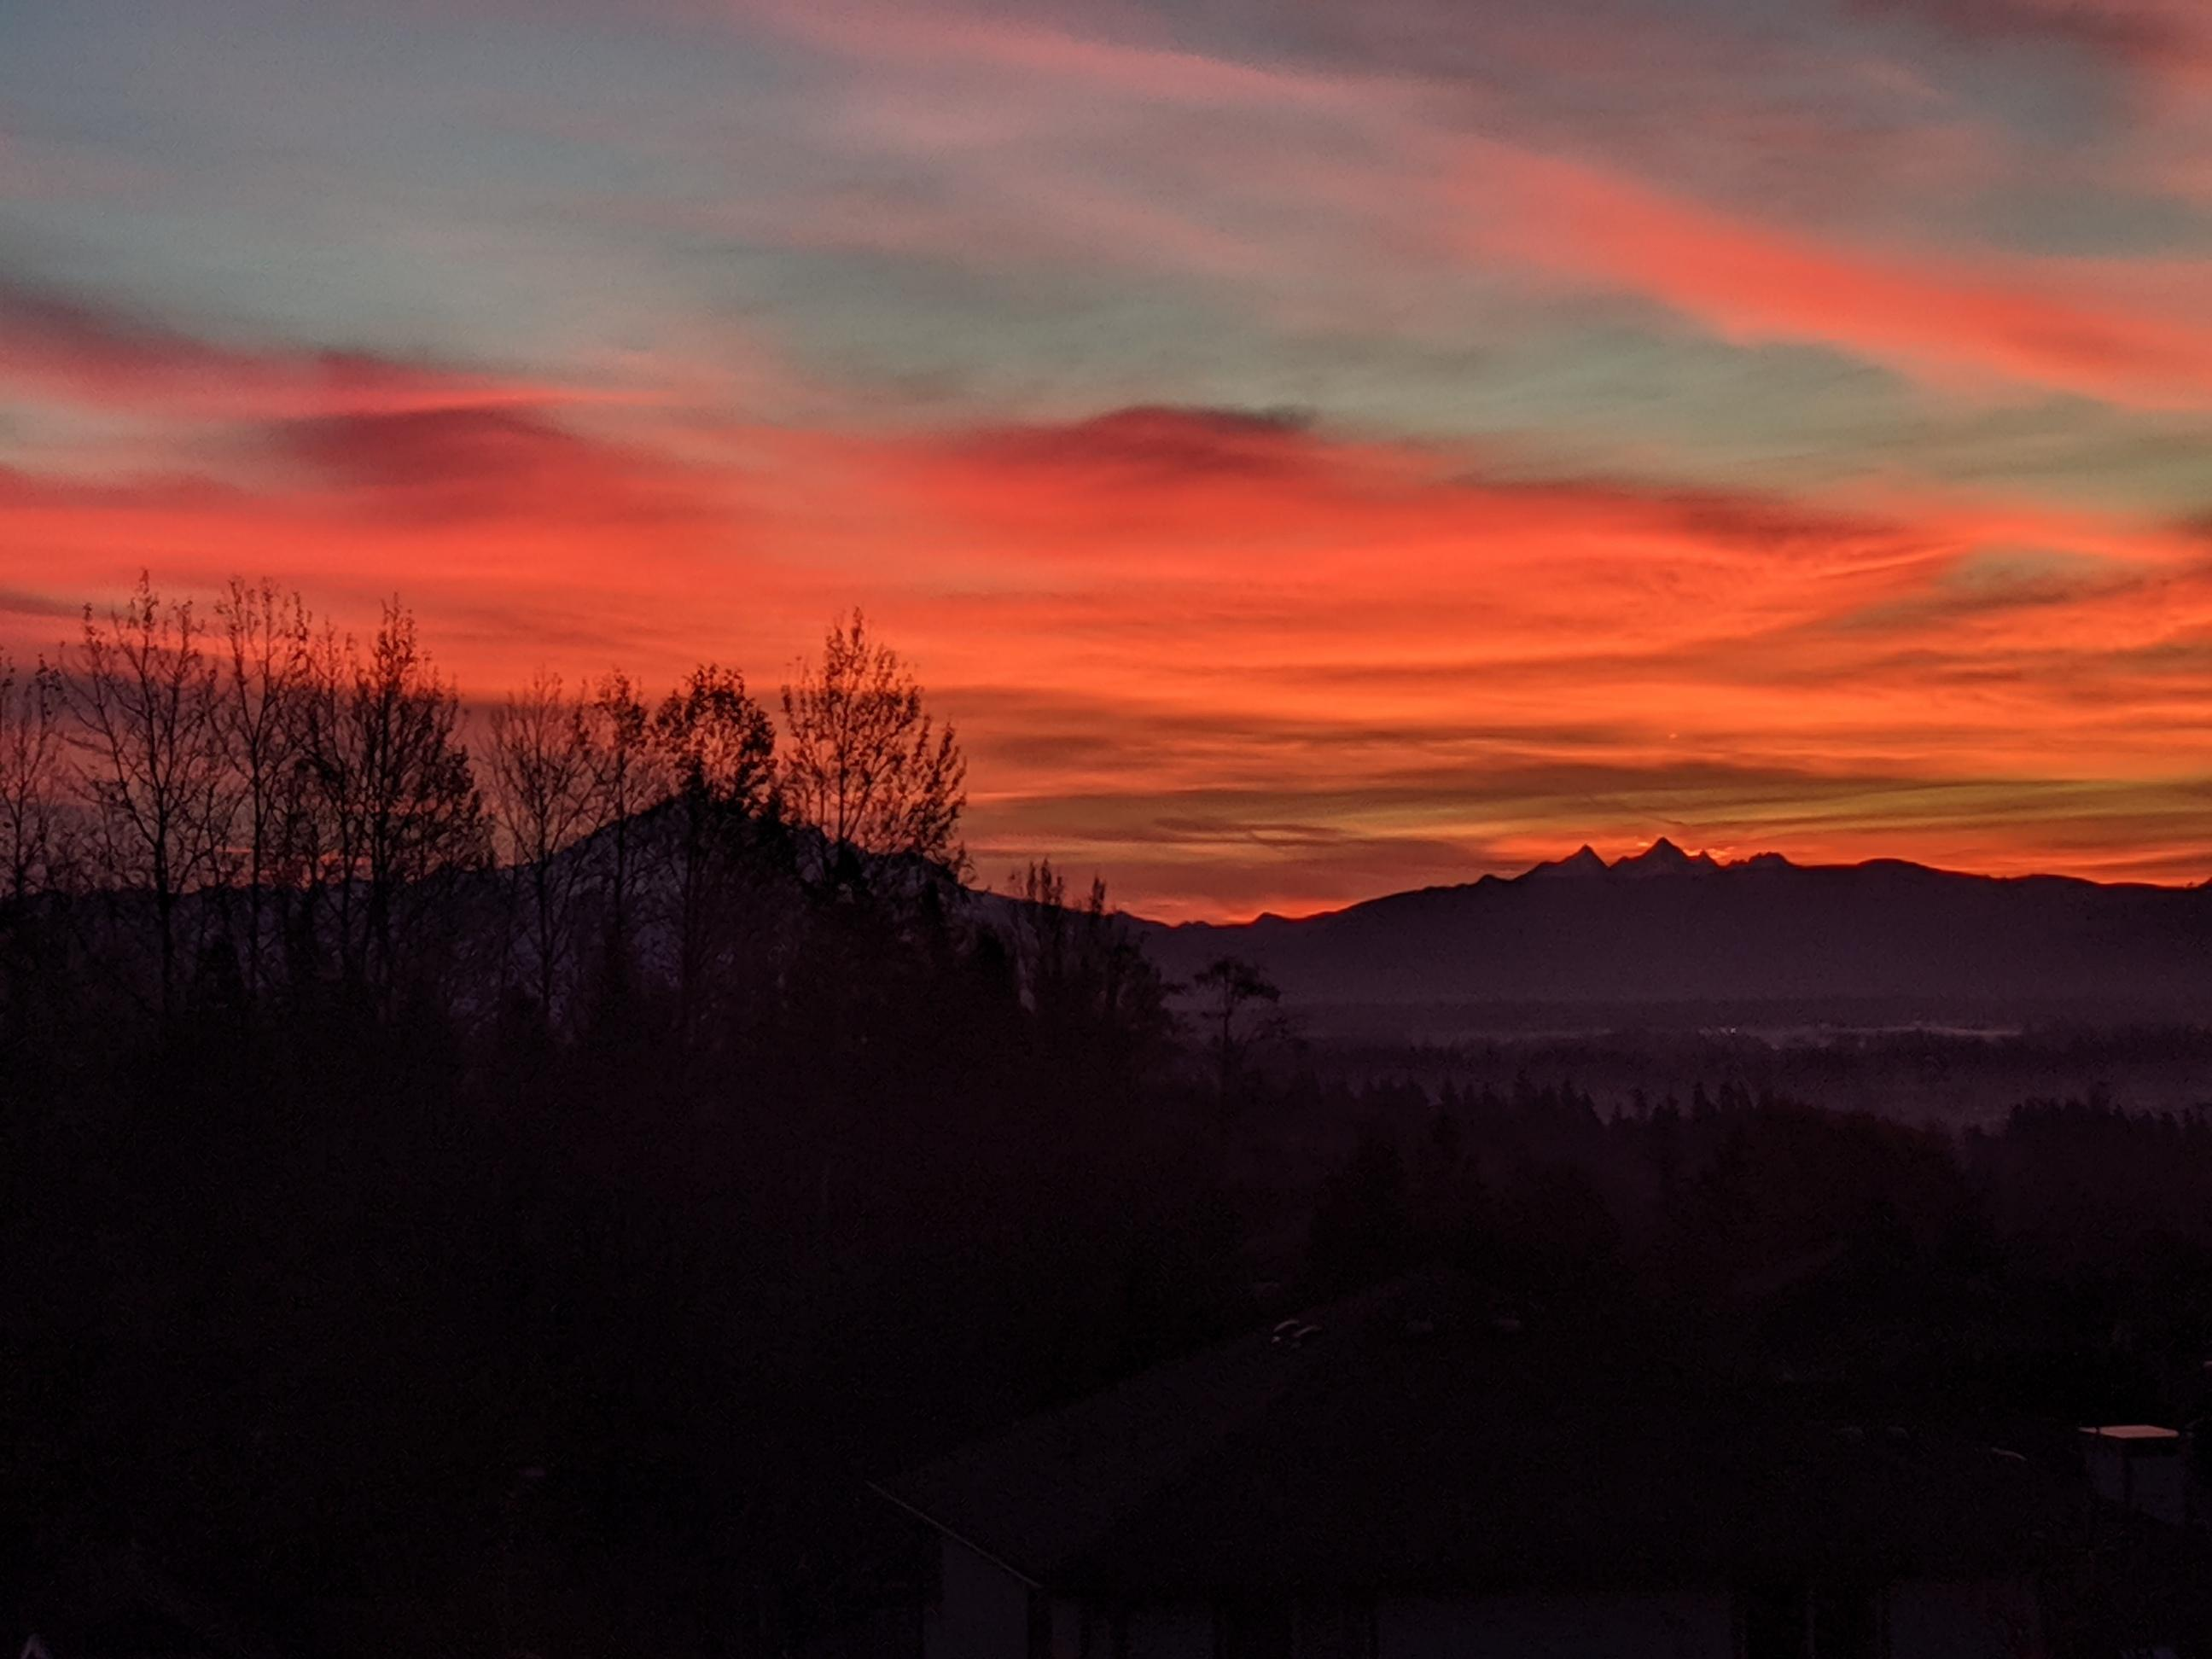 Sunrise (November 8, 2019). Photo courtesy of Chloe Knight.